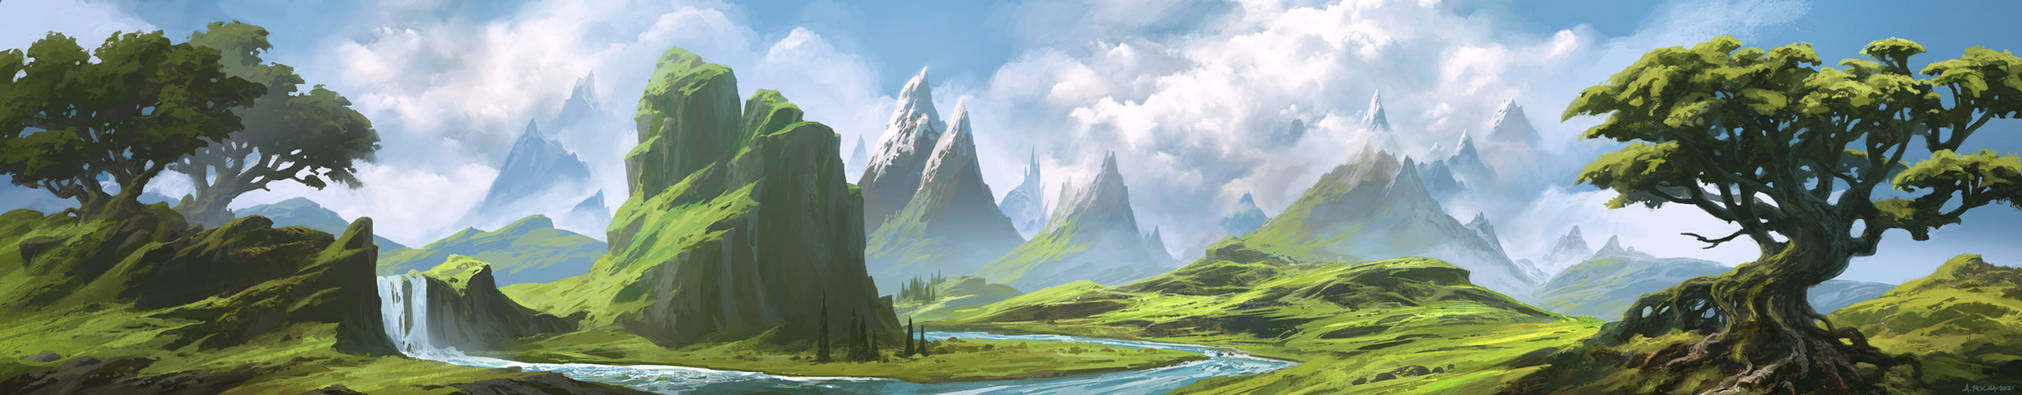 Loke Battlemats - Landscape